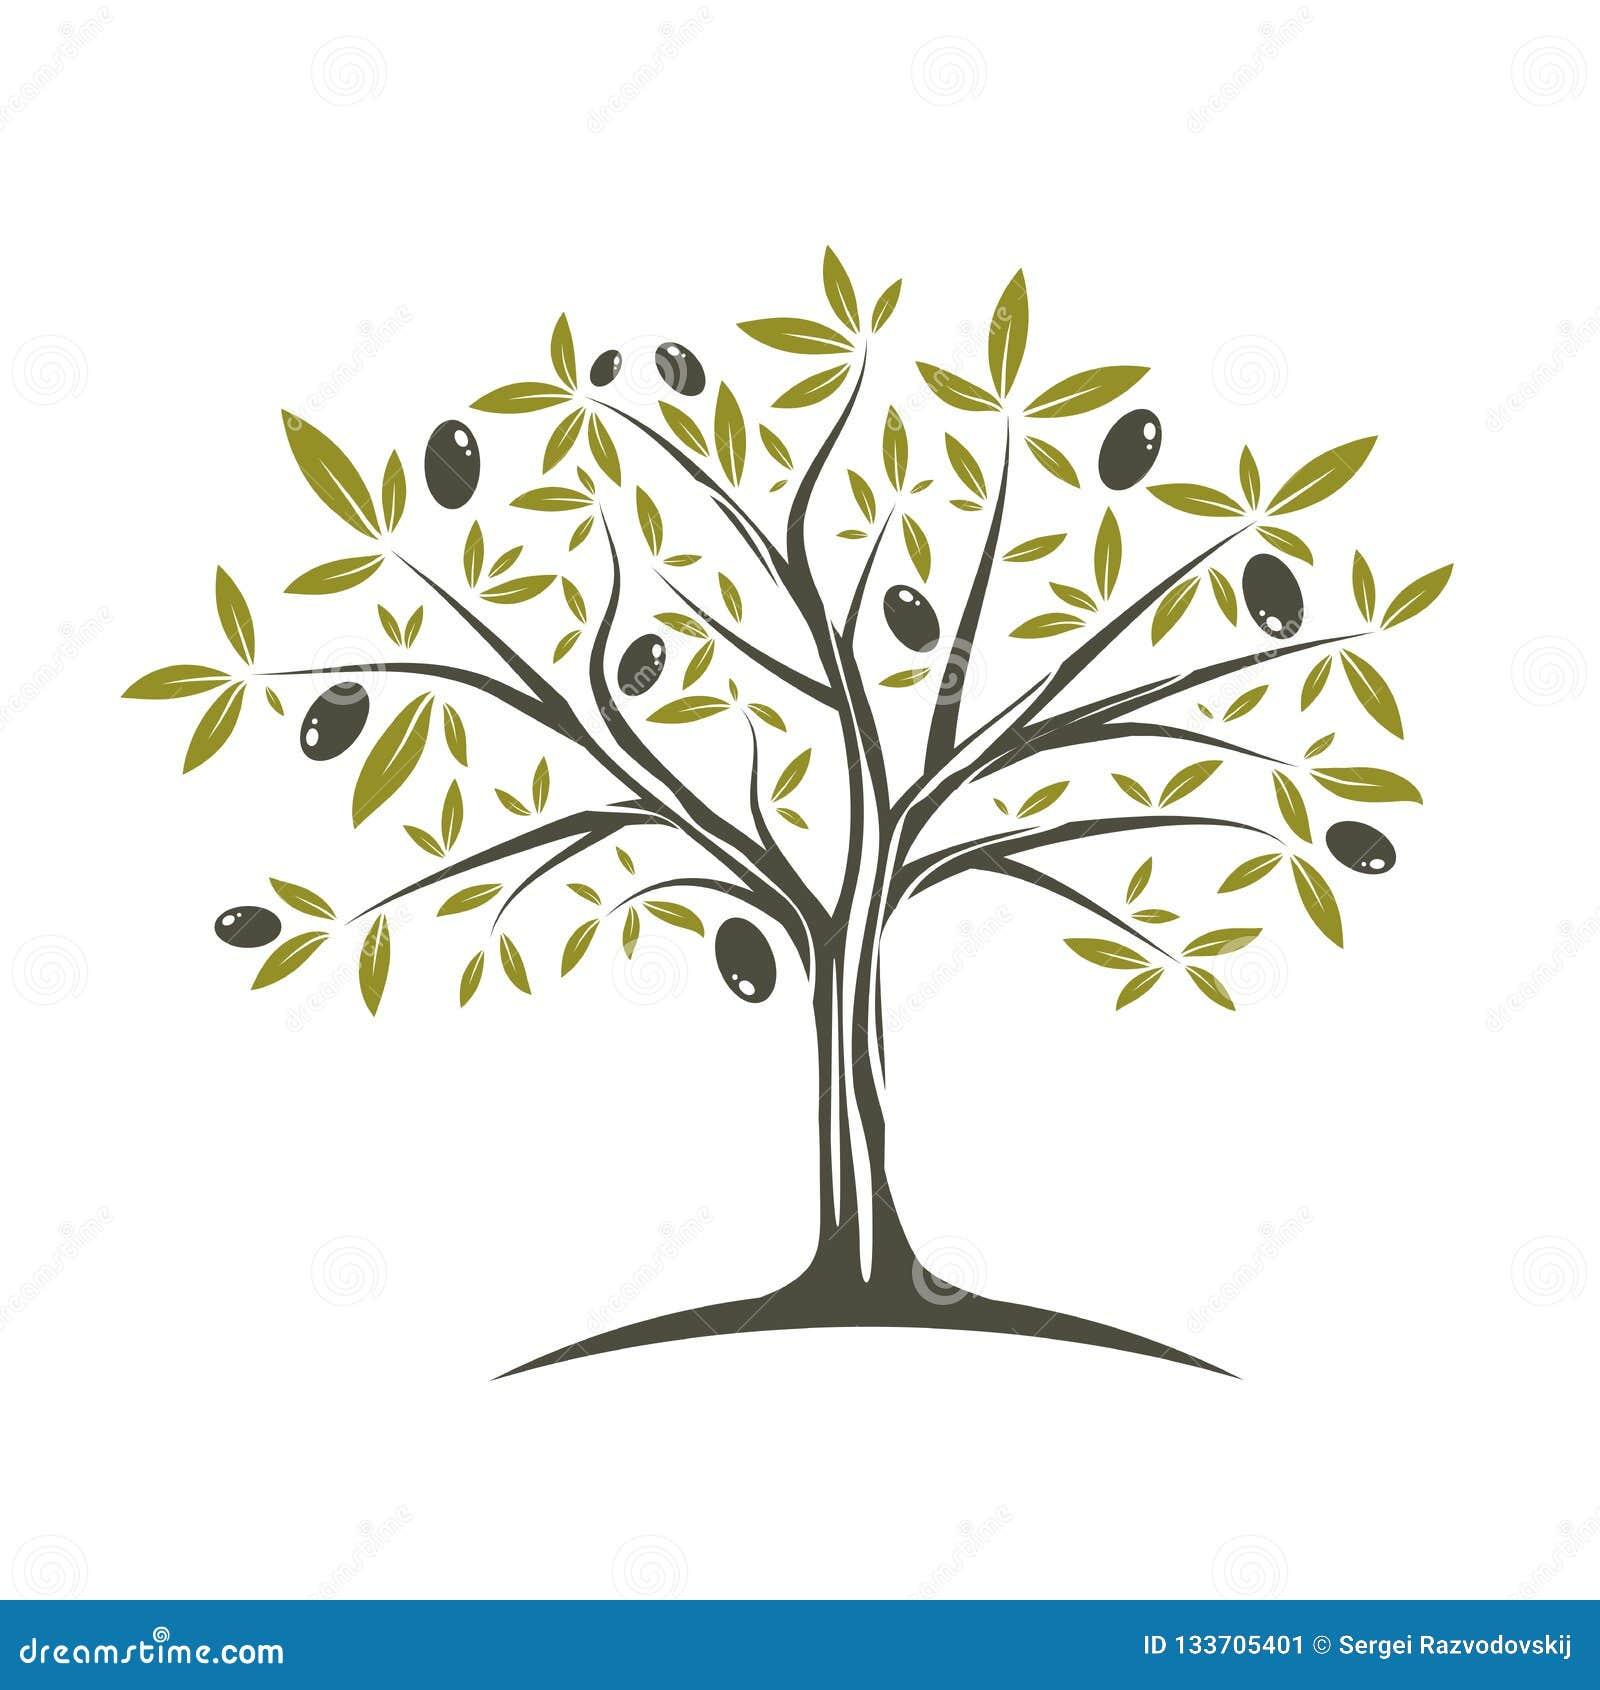 Enige olijfboom